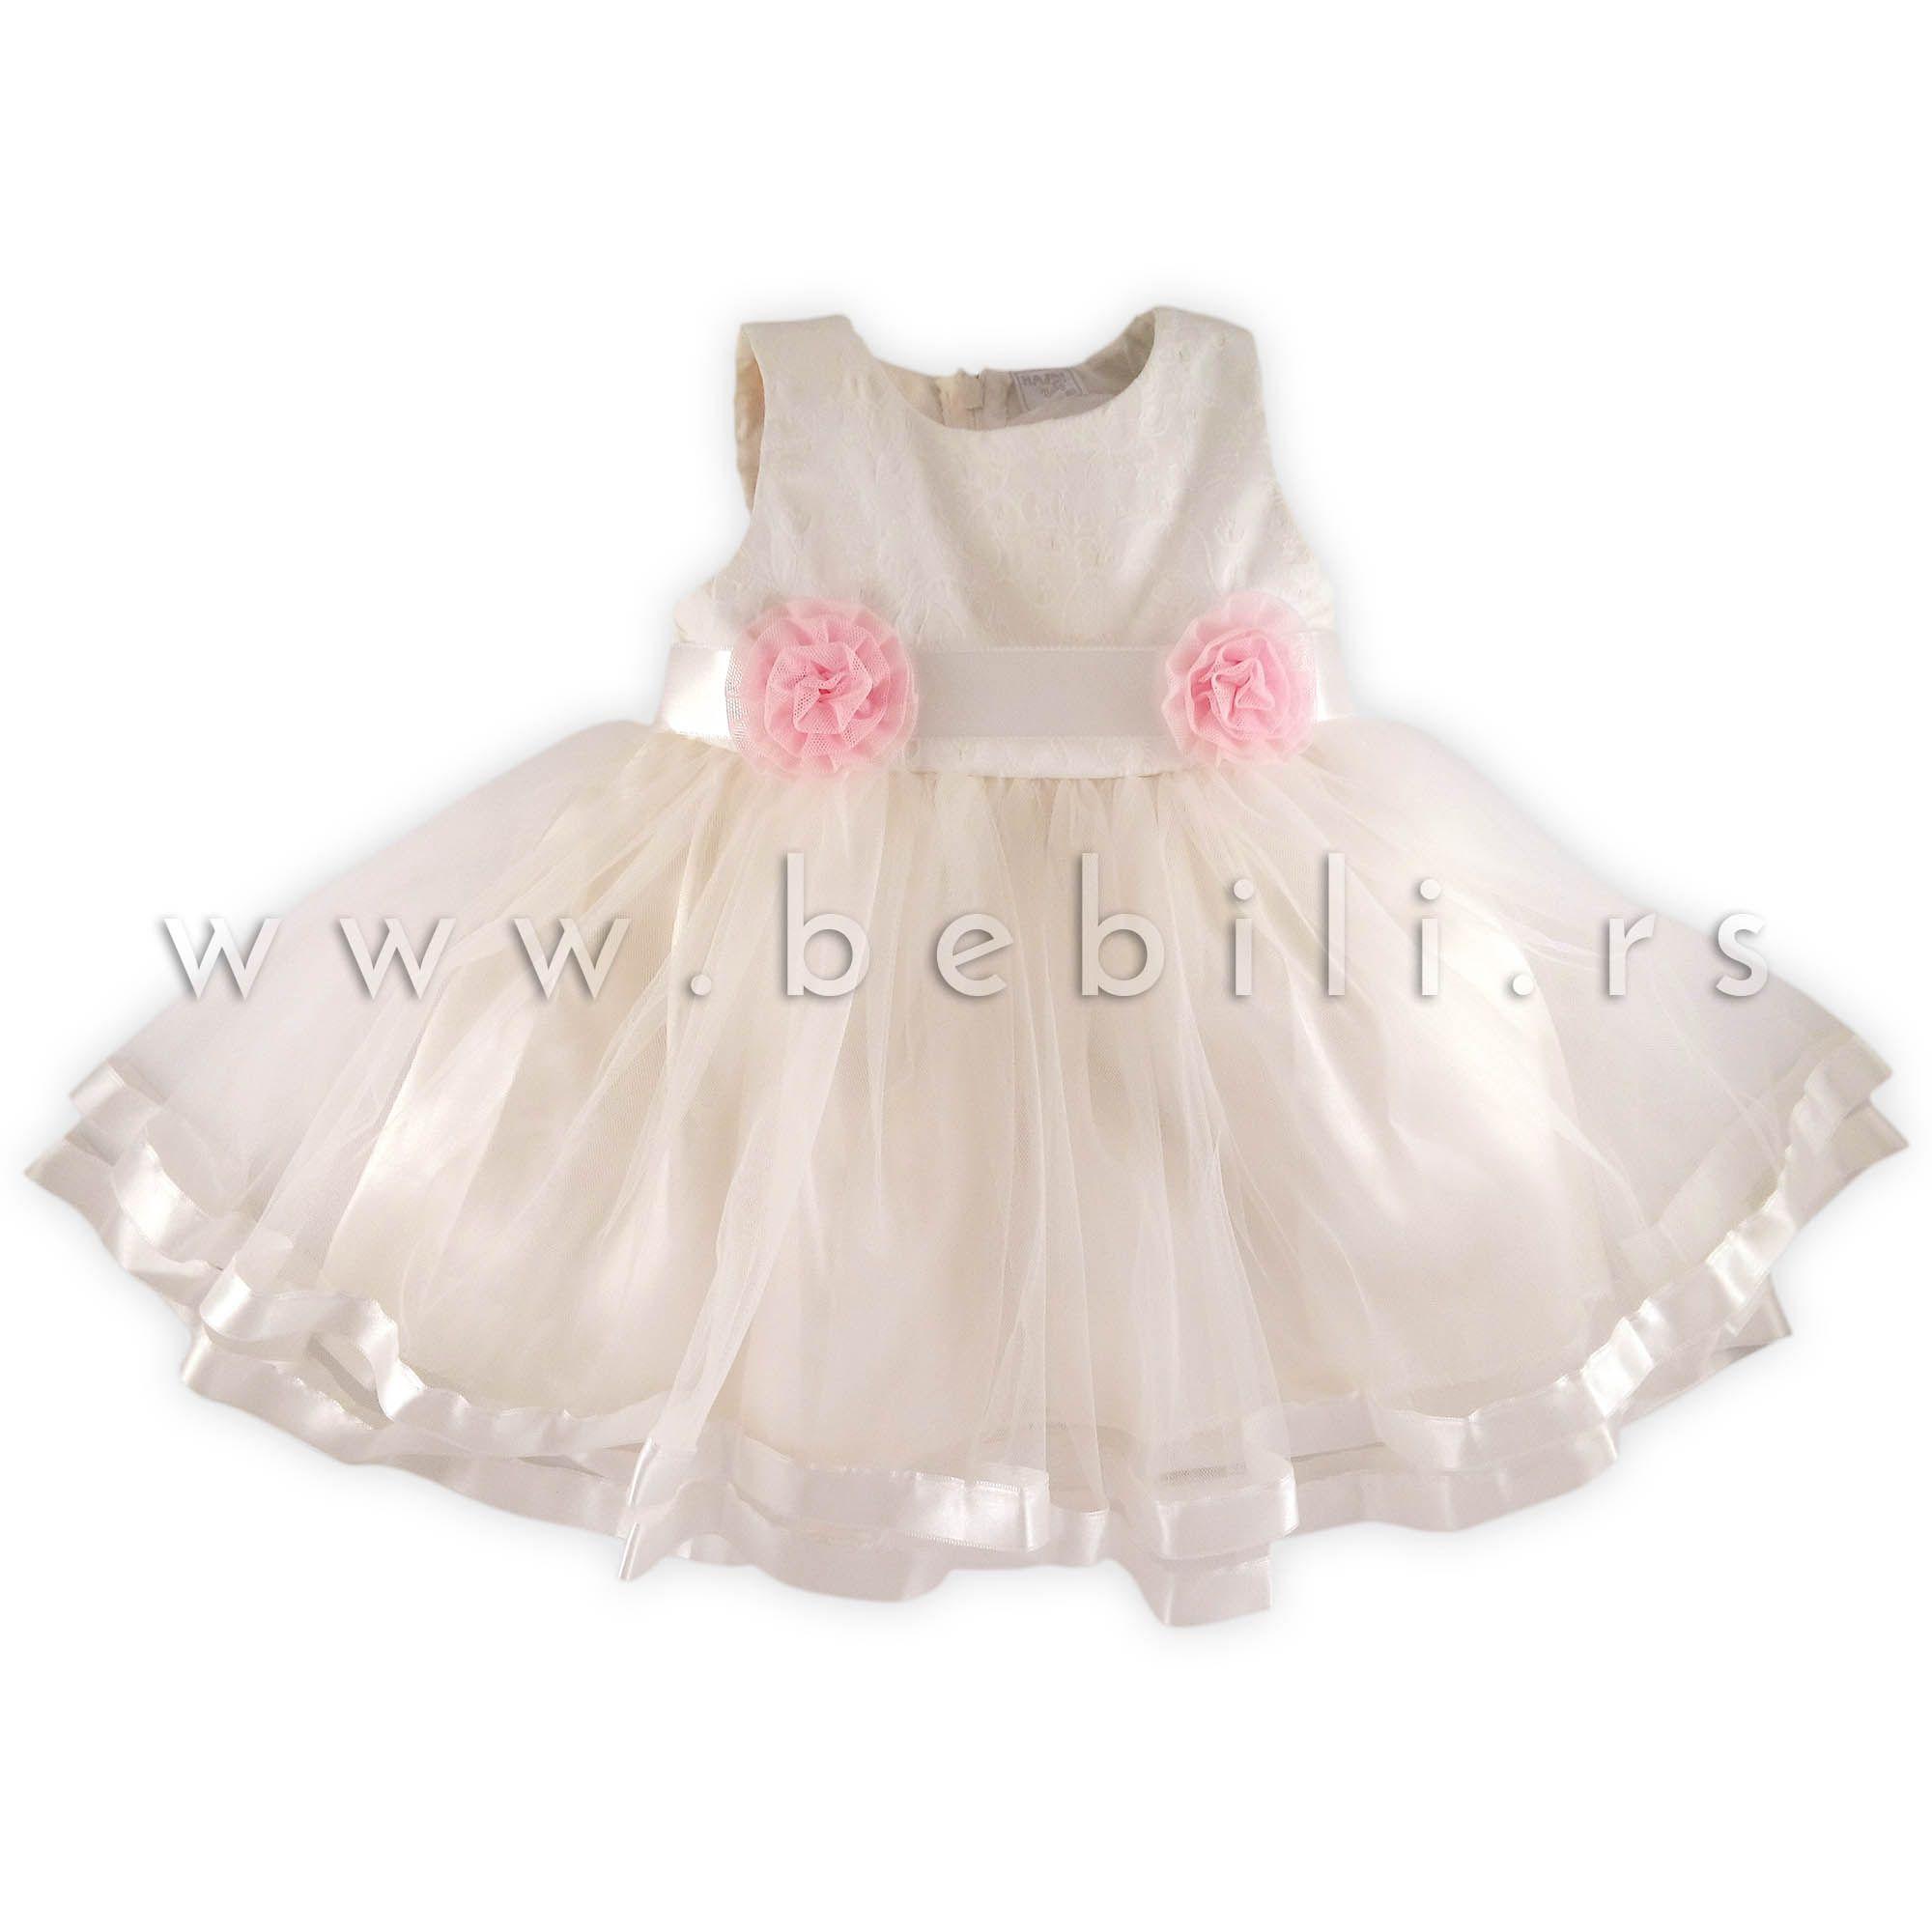 Hajdi Svečana Haljina Za Bebe Beli Cvetić Girls Dresses